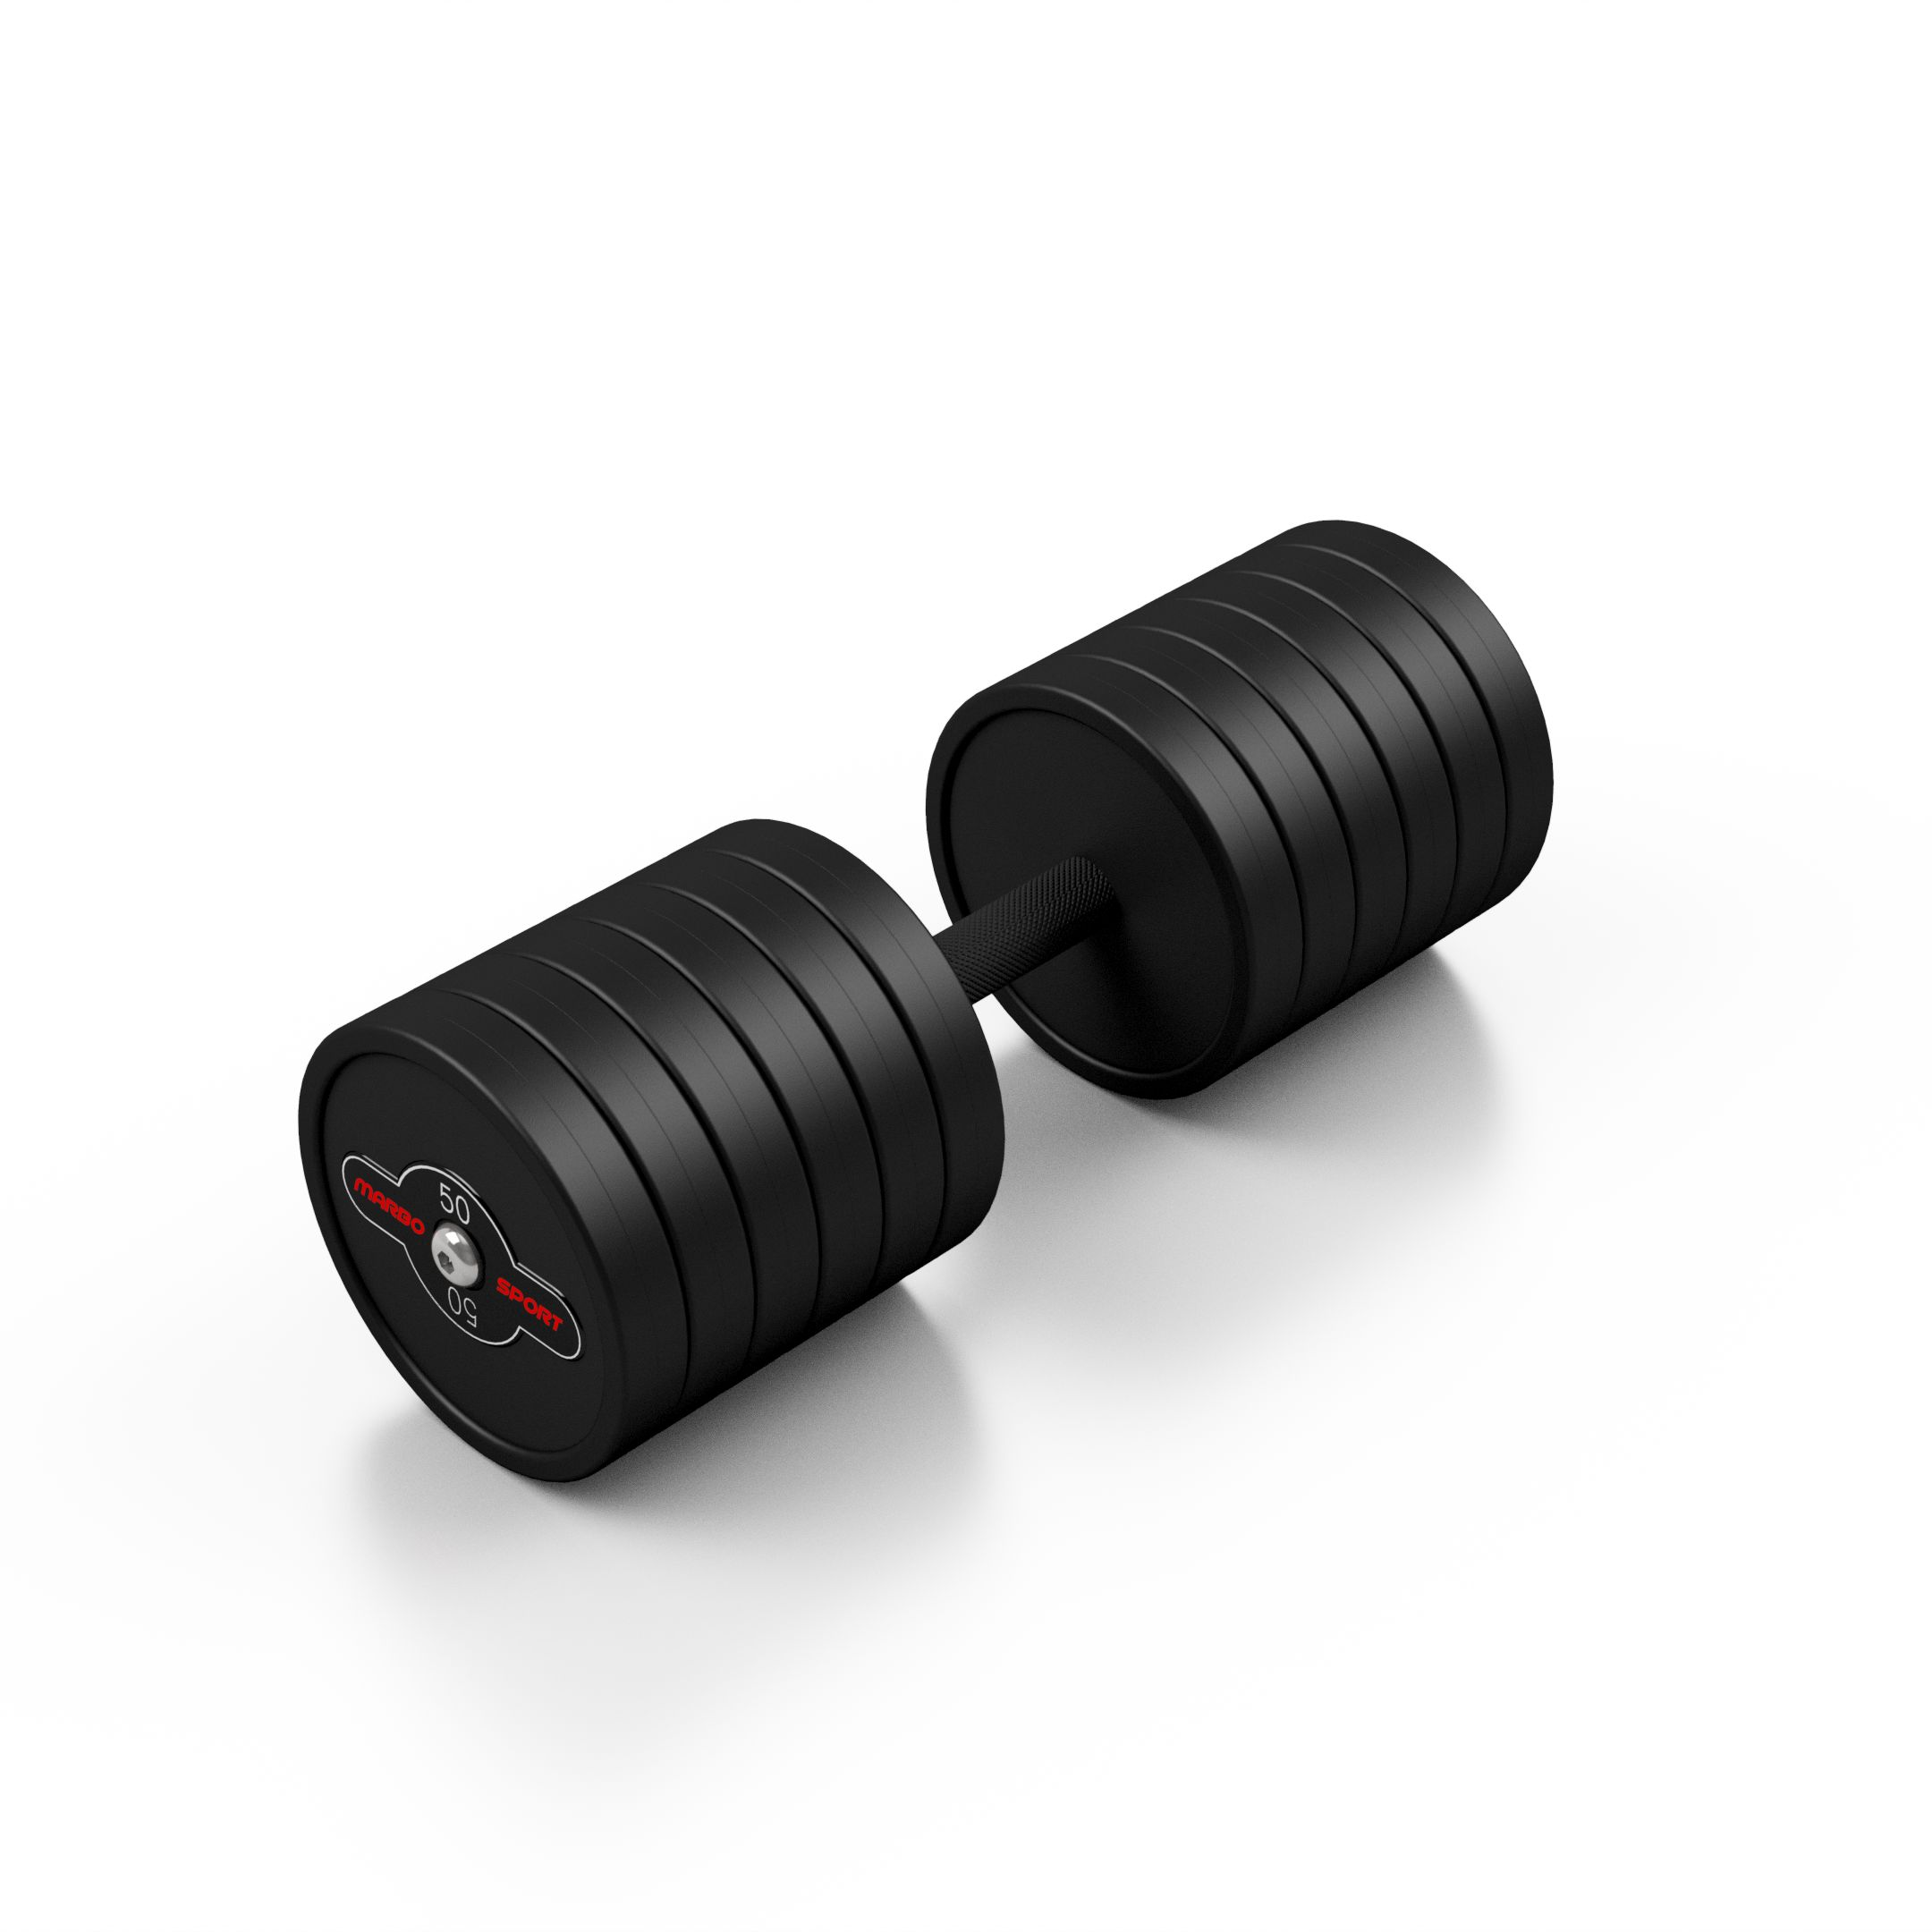 Hantla stalowa gumowana 50 kg czarny mat - Marbo Sport - 50 kg